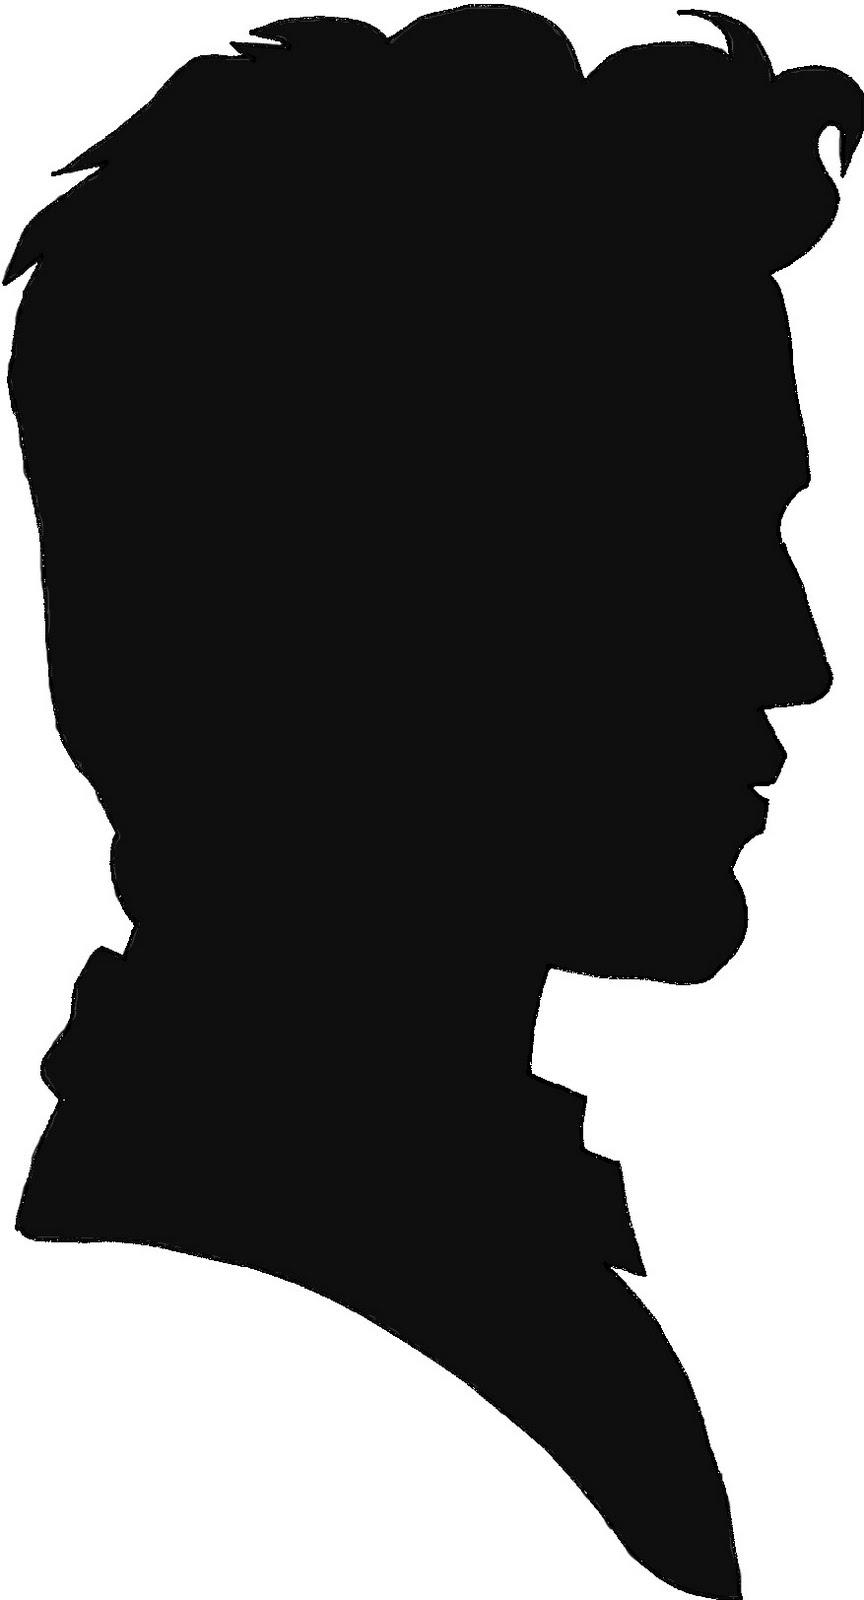 Man Profile Silhouette Clipart - Clipart Suggest